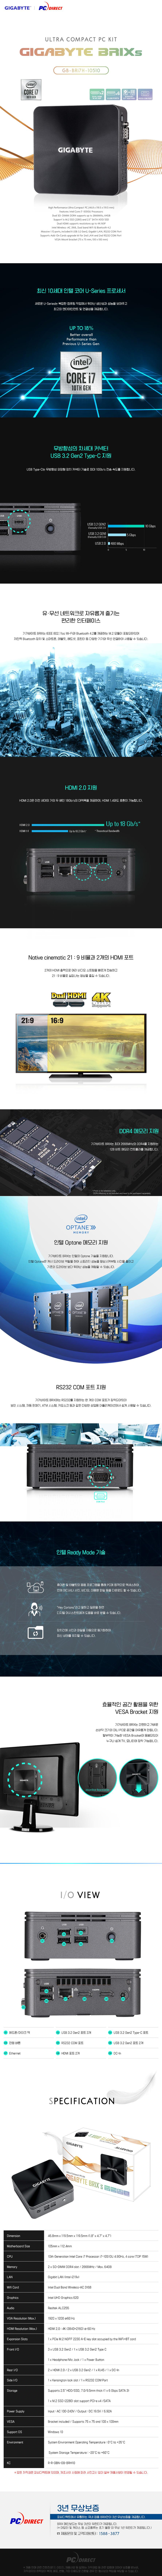 GIGABYTE BRIX GB-BRi7H-10510 M2 피씨디렉트 (8GB, M2 120GB)